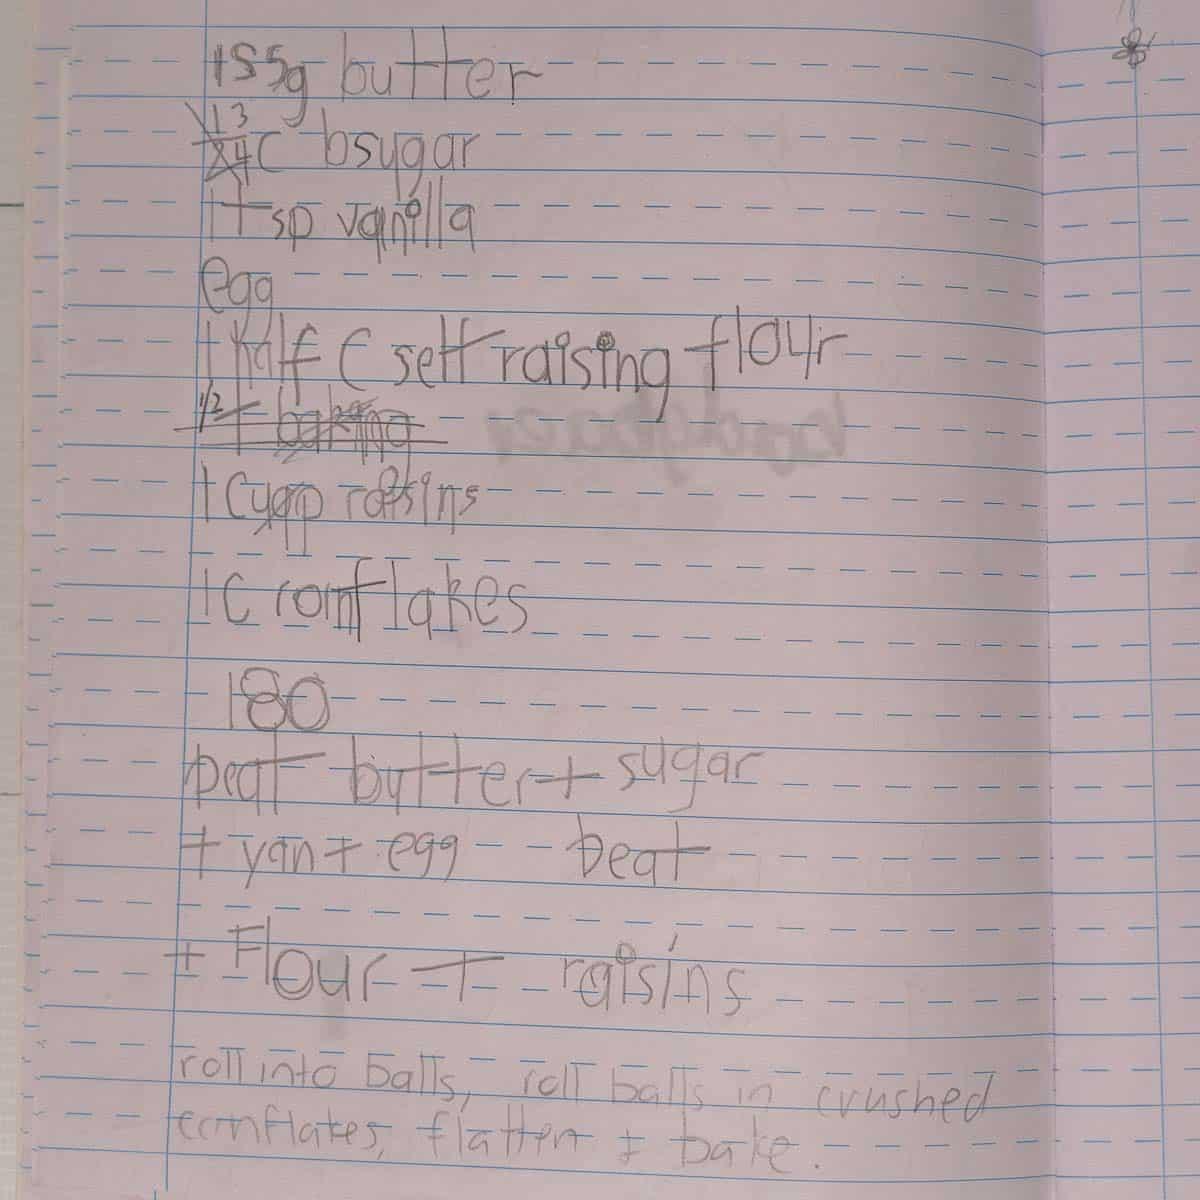 handwritten recipe pn lined paper written in child's handwriting